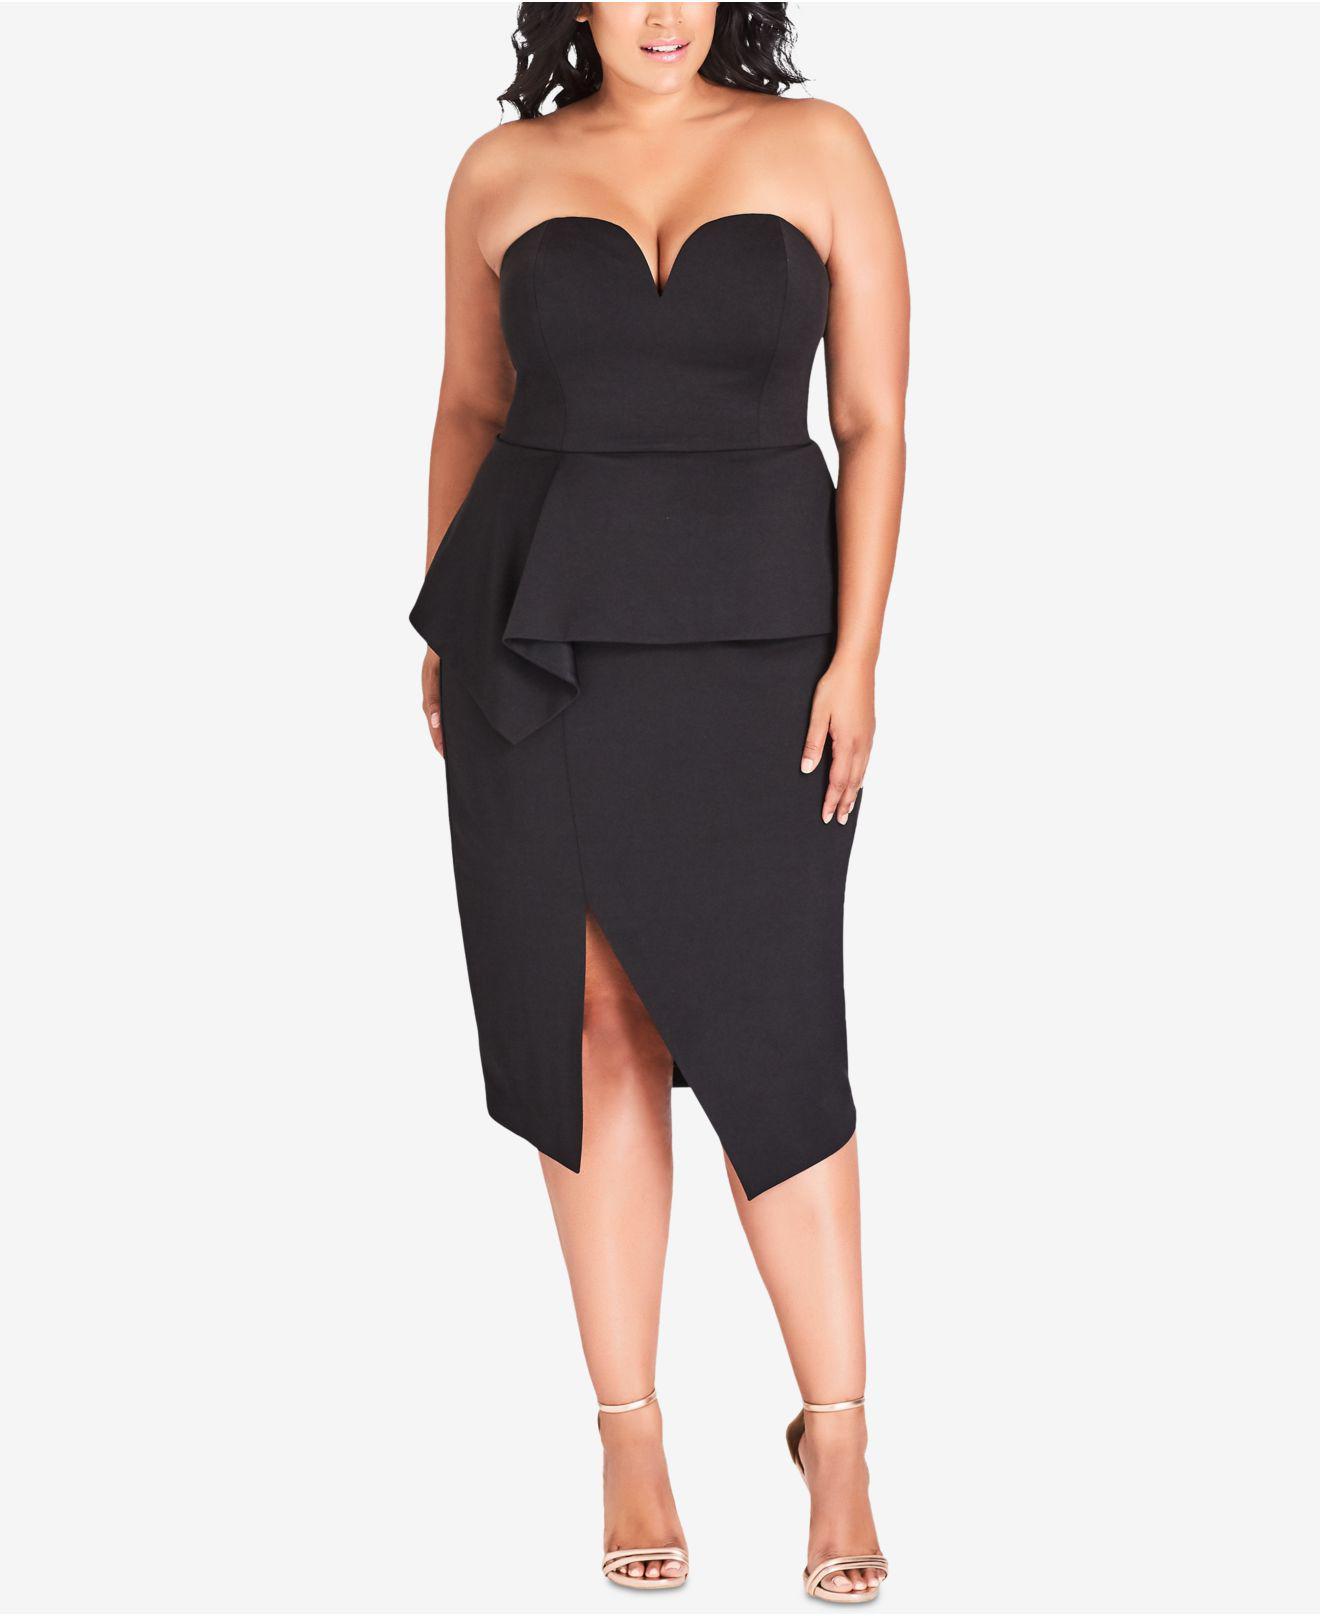 Trendy Plus Size Strapless Peplum Dress